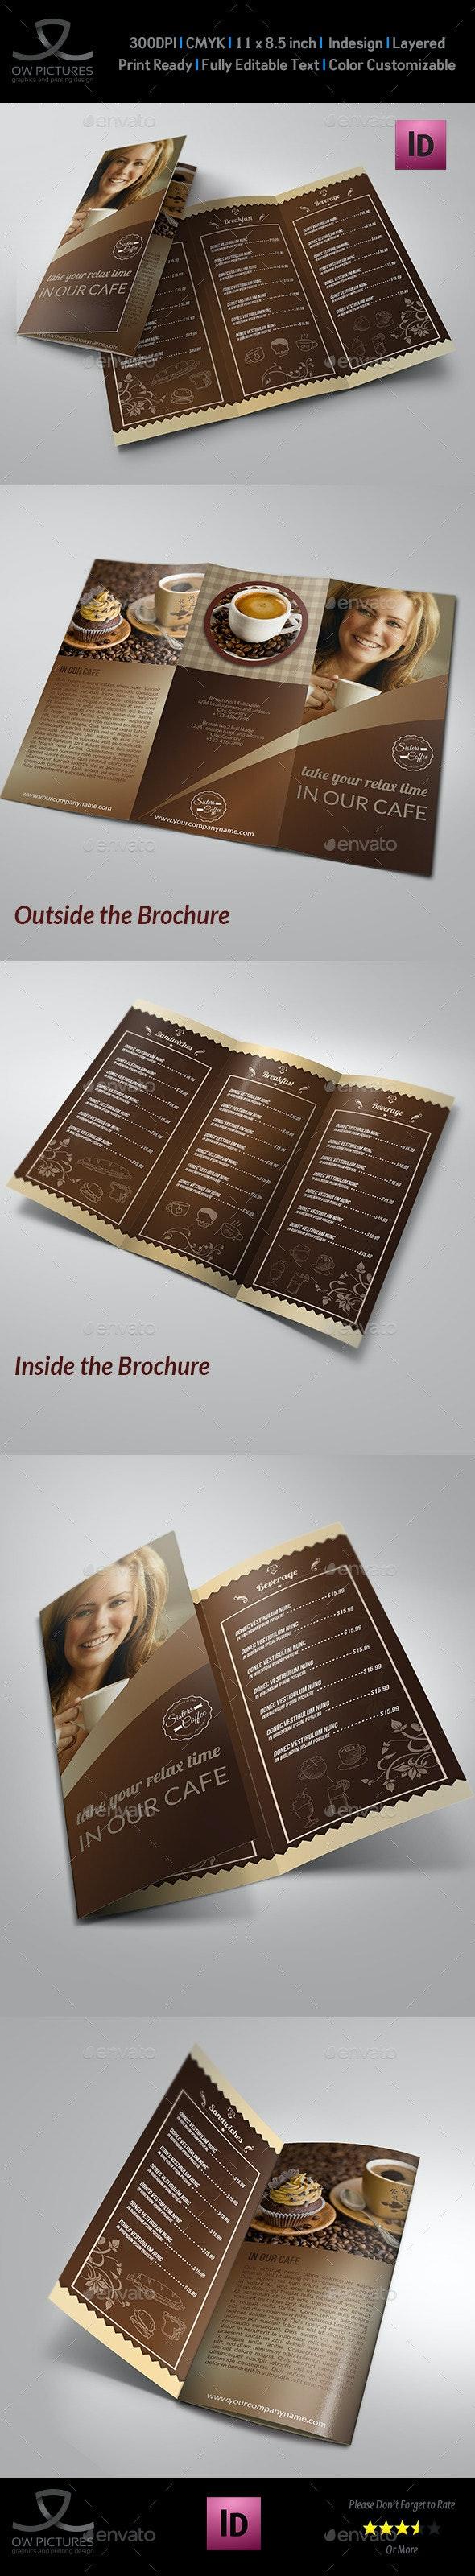 Cafe and Coffee Shop Menu Tri-Fold Brochure - Food Menus Print Templates